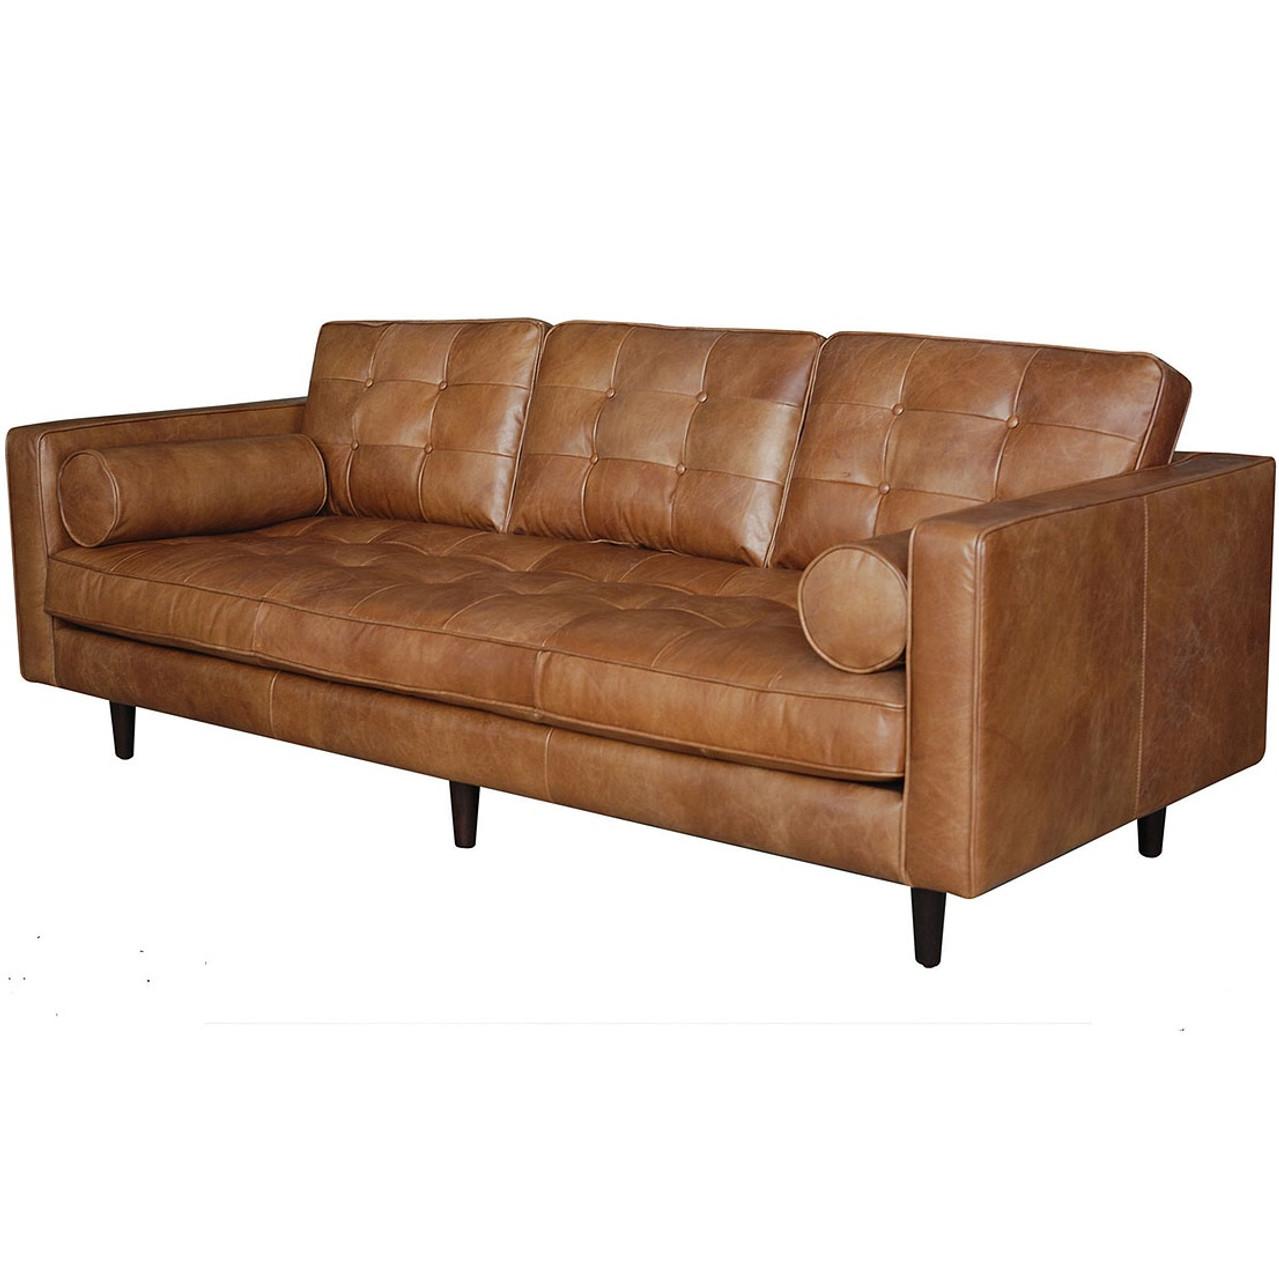 Maxwell Modern Leather Sofa 89 Zin Home